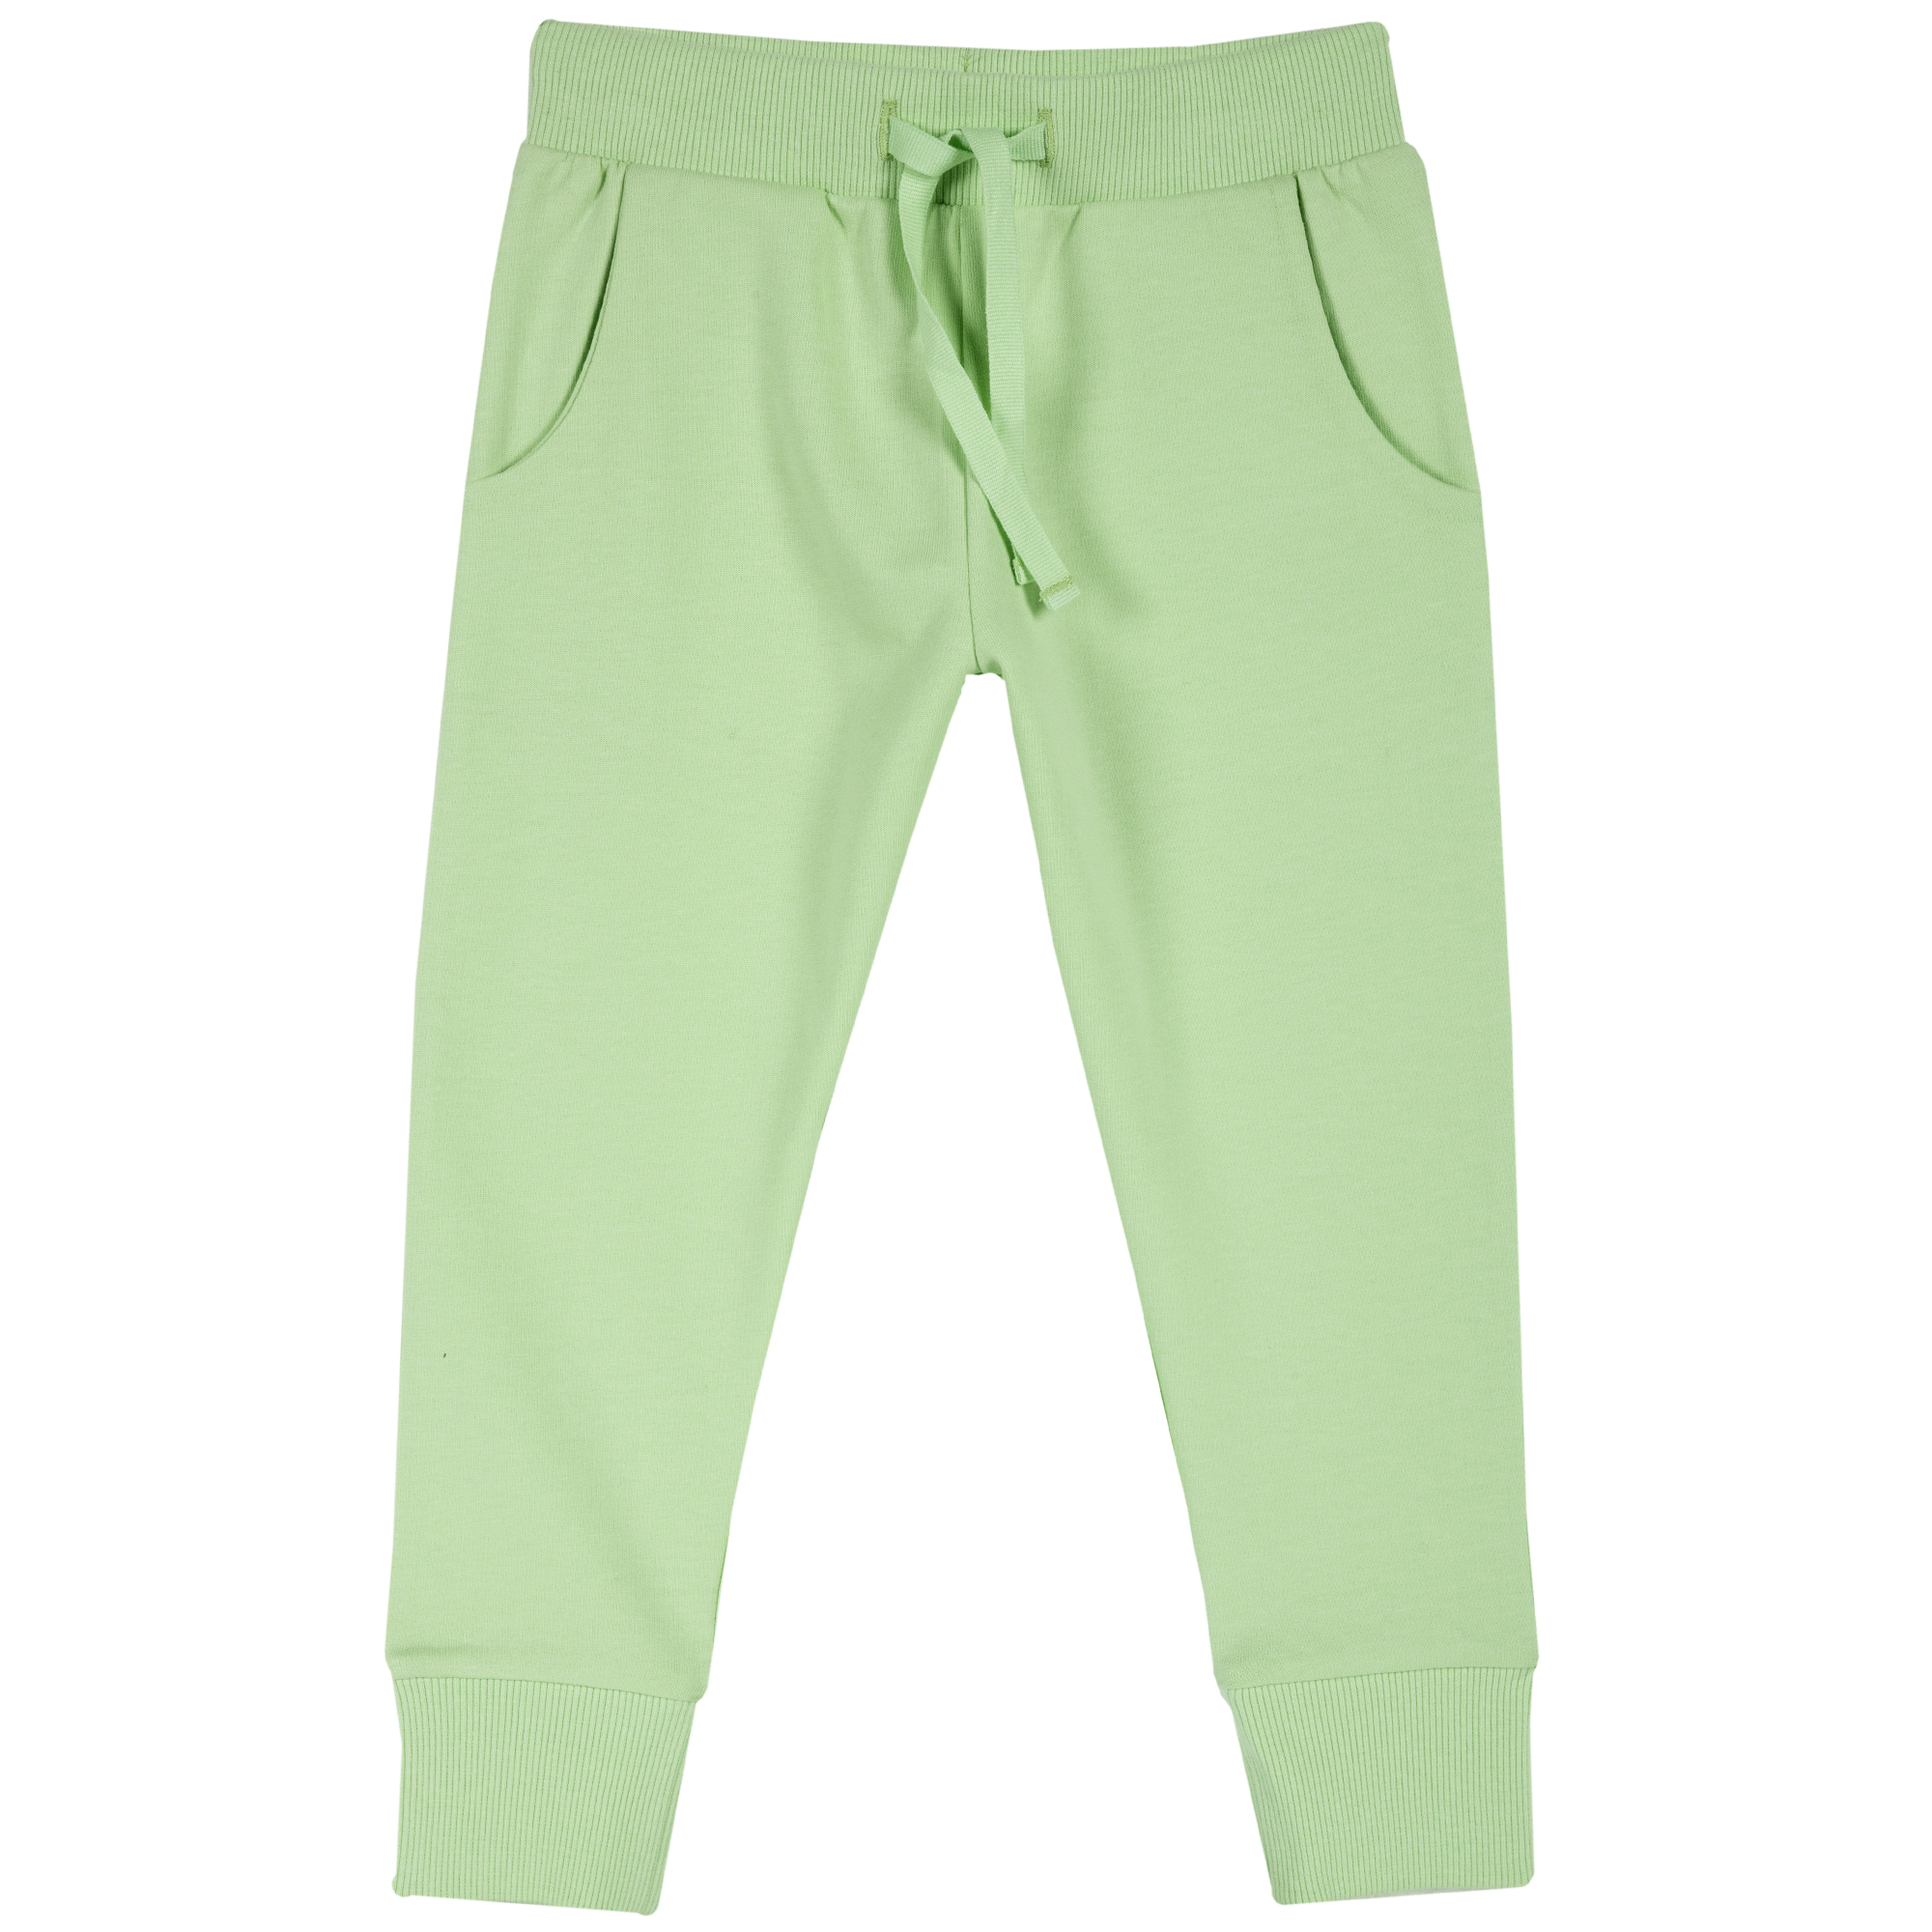 Pantalon trening copii Chicco, manseta elastica, verde, 24932 din categoria Pantaloni copii